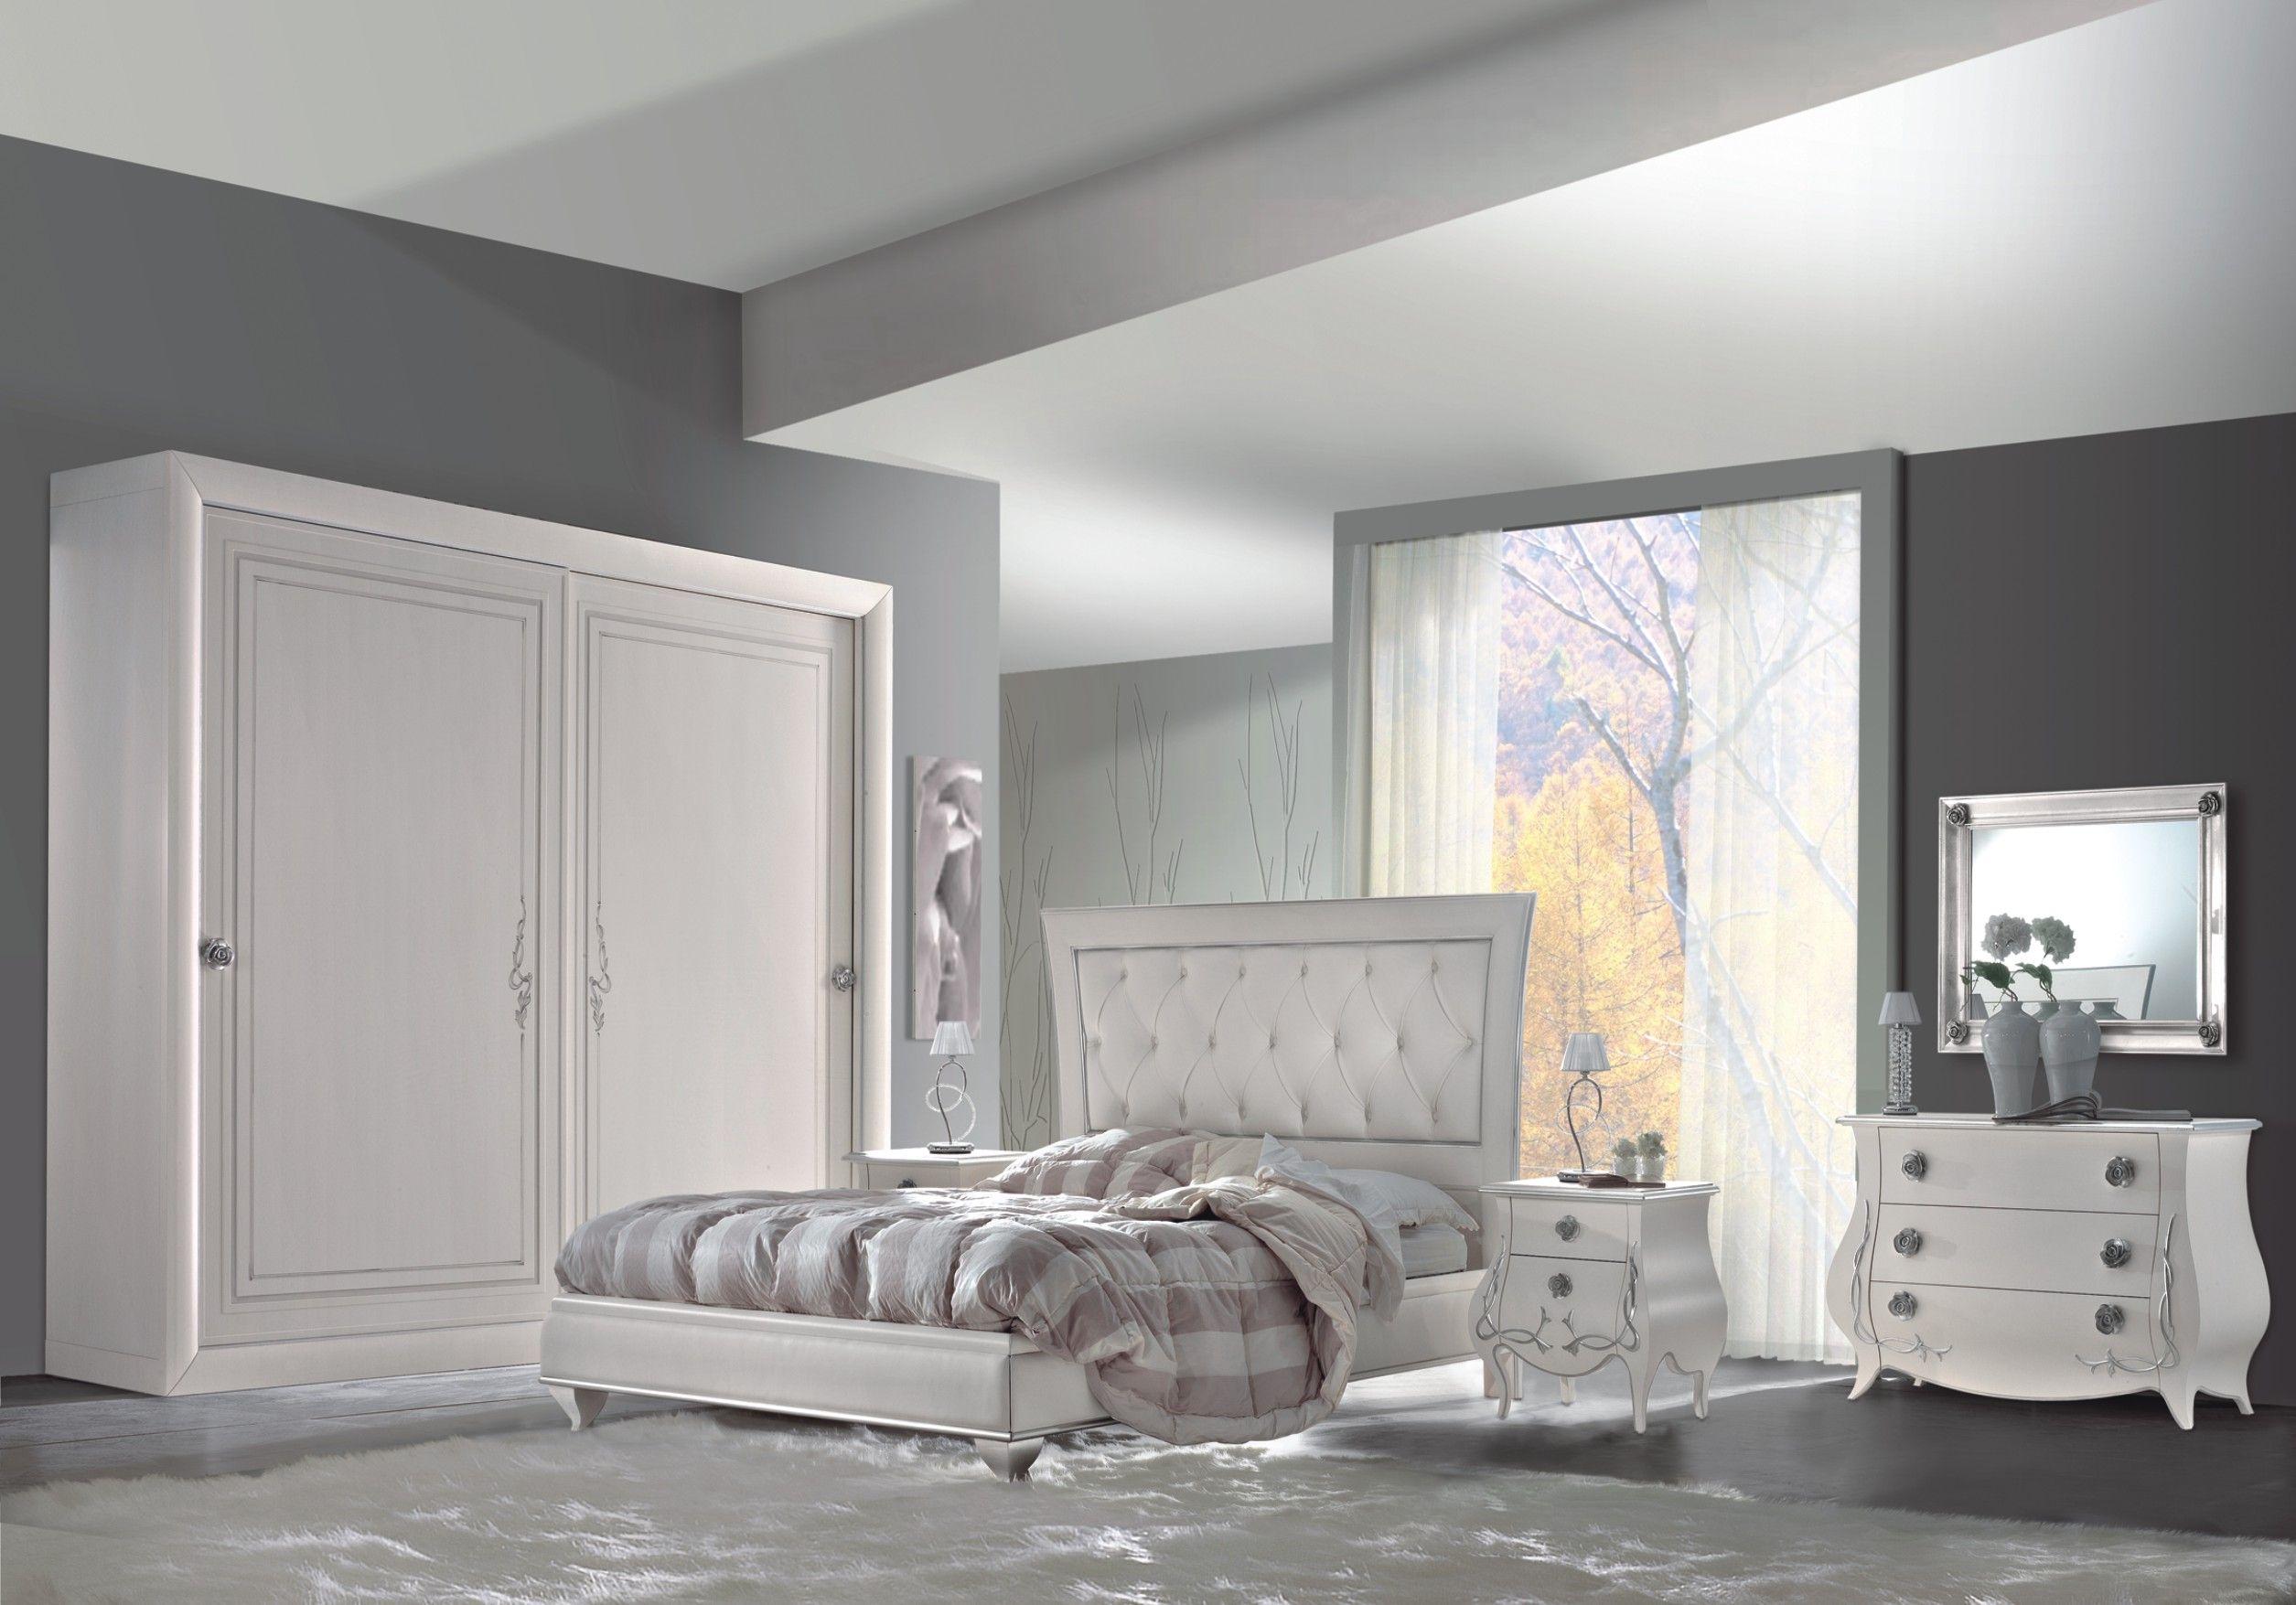 Parete Camera Da Letto Argento : Mobili camera da letto argento camera da letto pareti argento